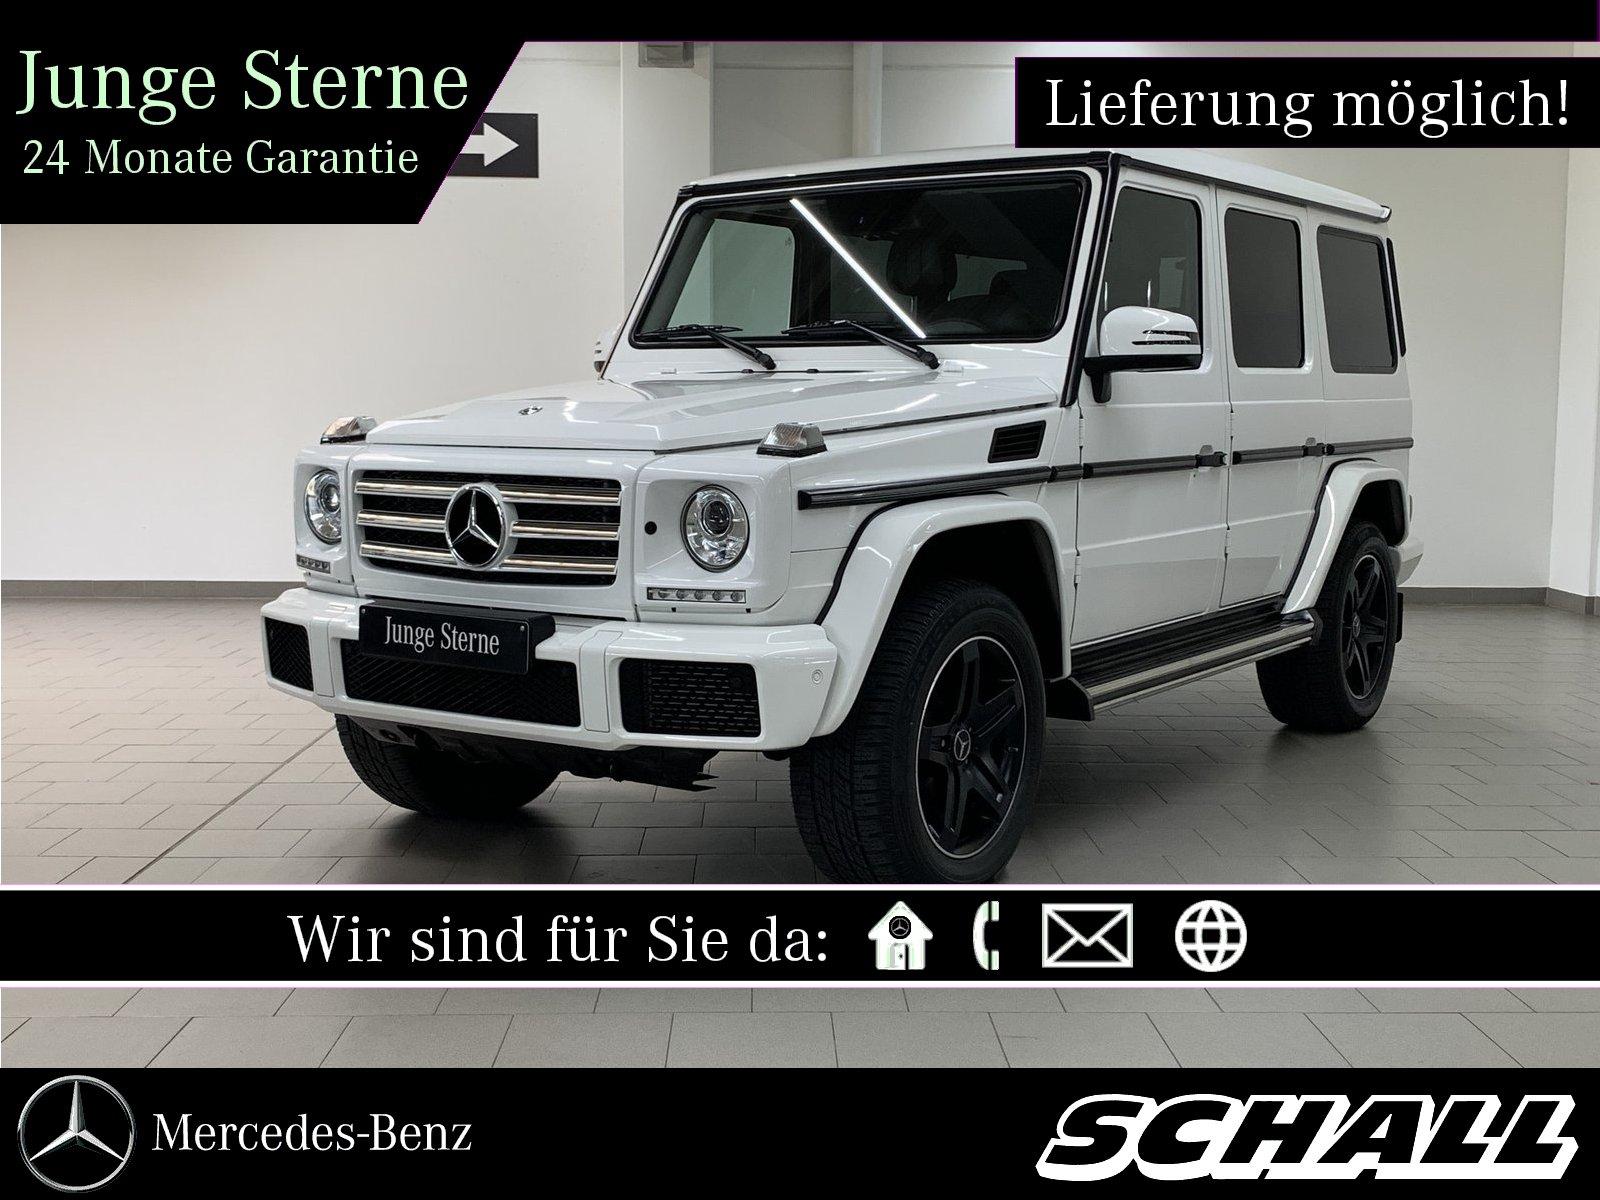 "Mercedes-Benz G 350 d SPORT PAKET+19""AMG+COMAND+RÜCKFAHRKAMERA, Jahr 2017, diesel"